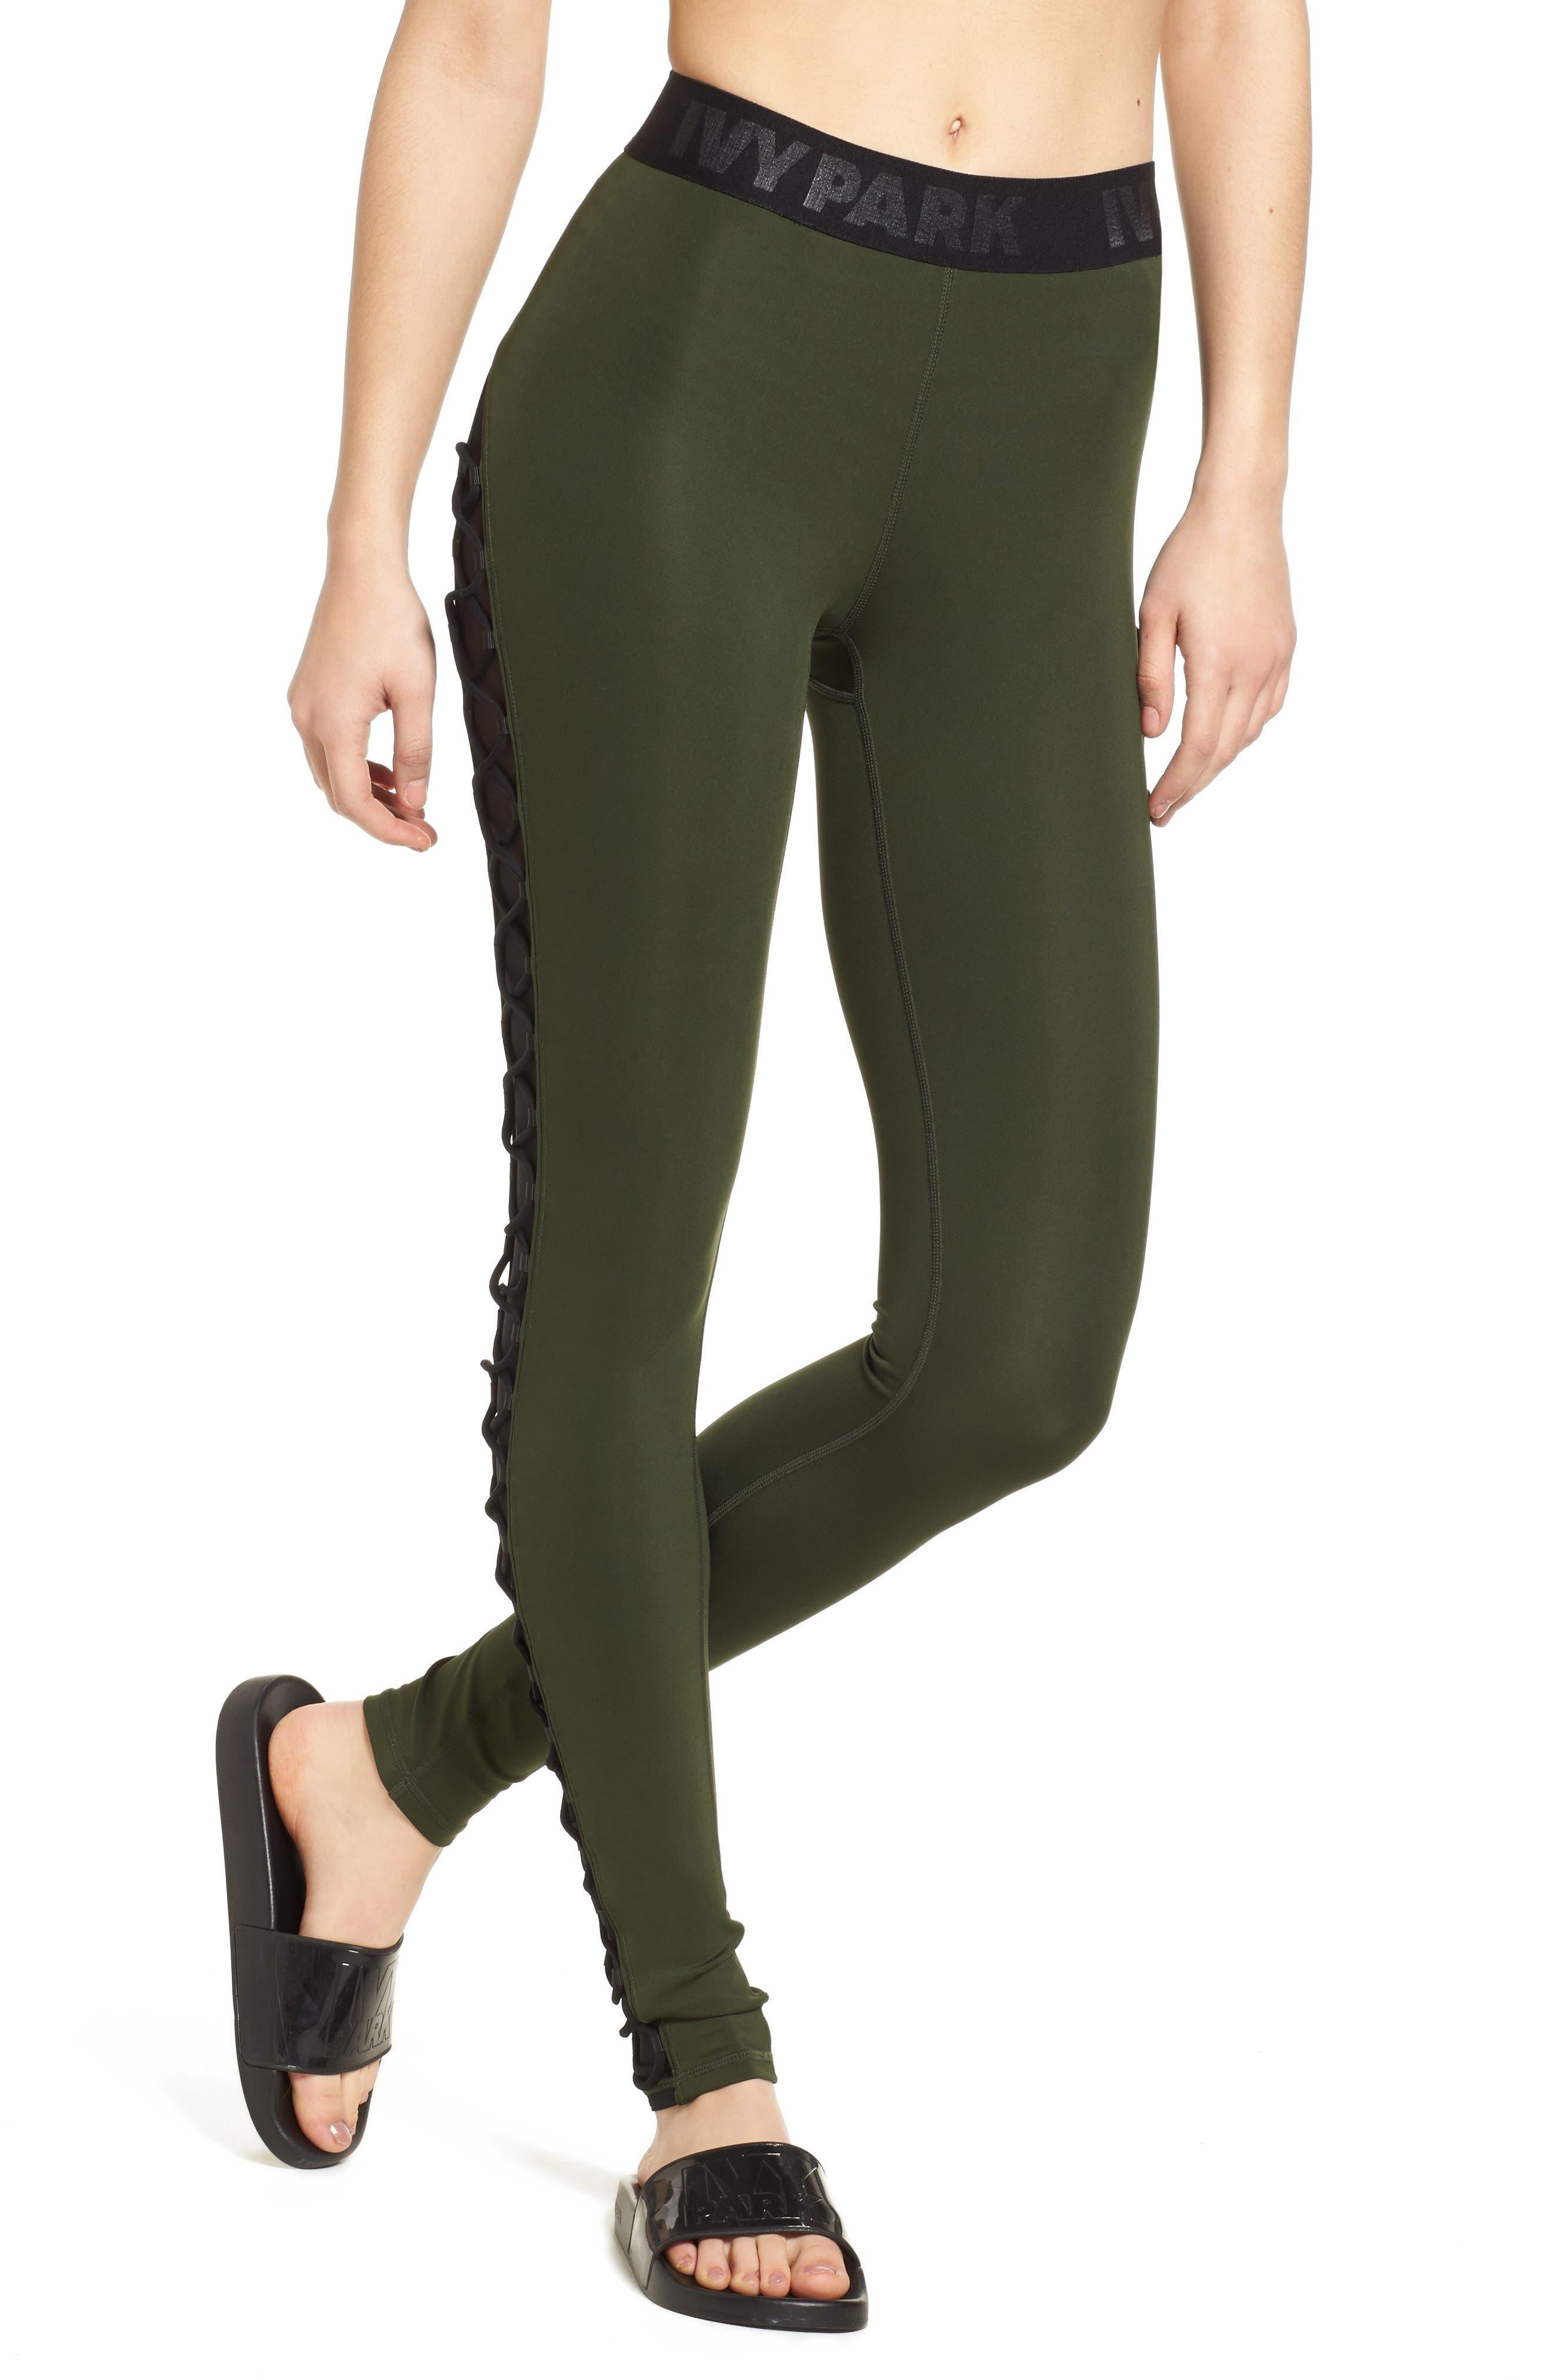 Main Image - Ivy Park® Mesh Lace-Up Leggings